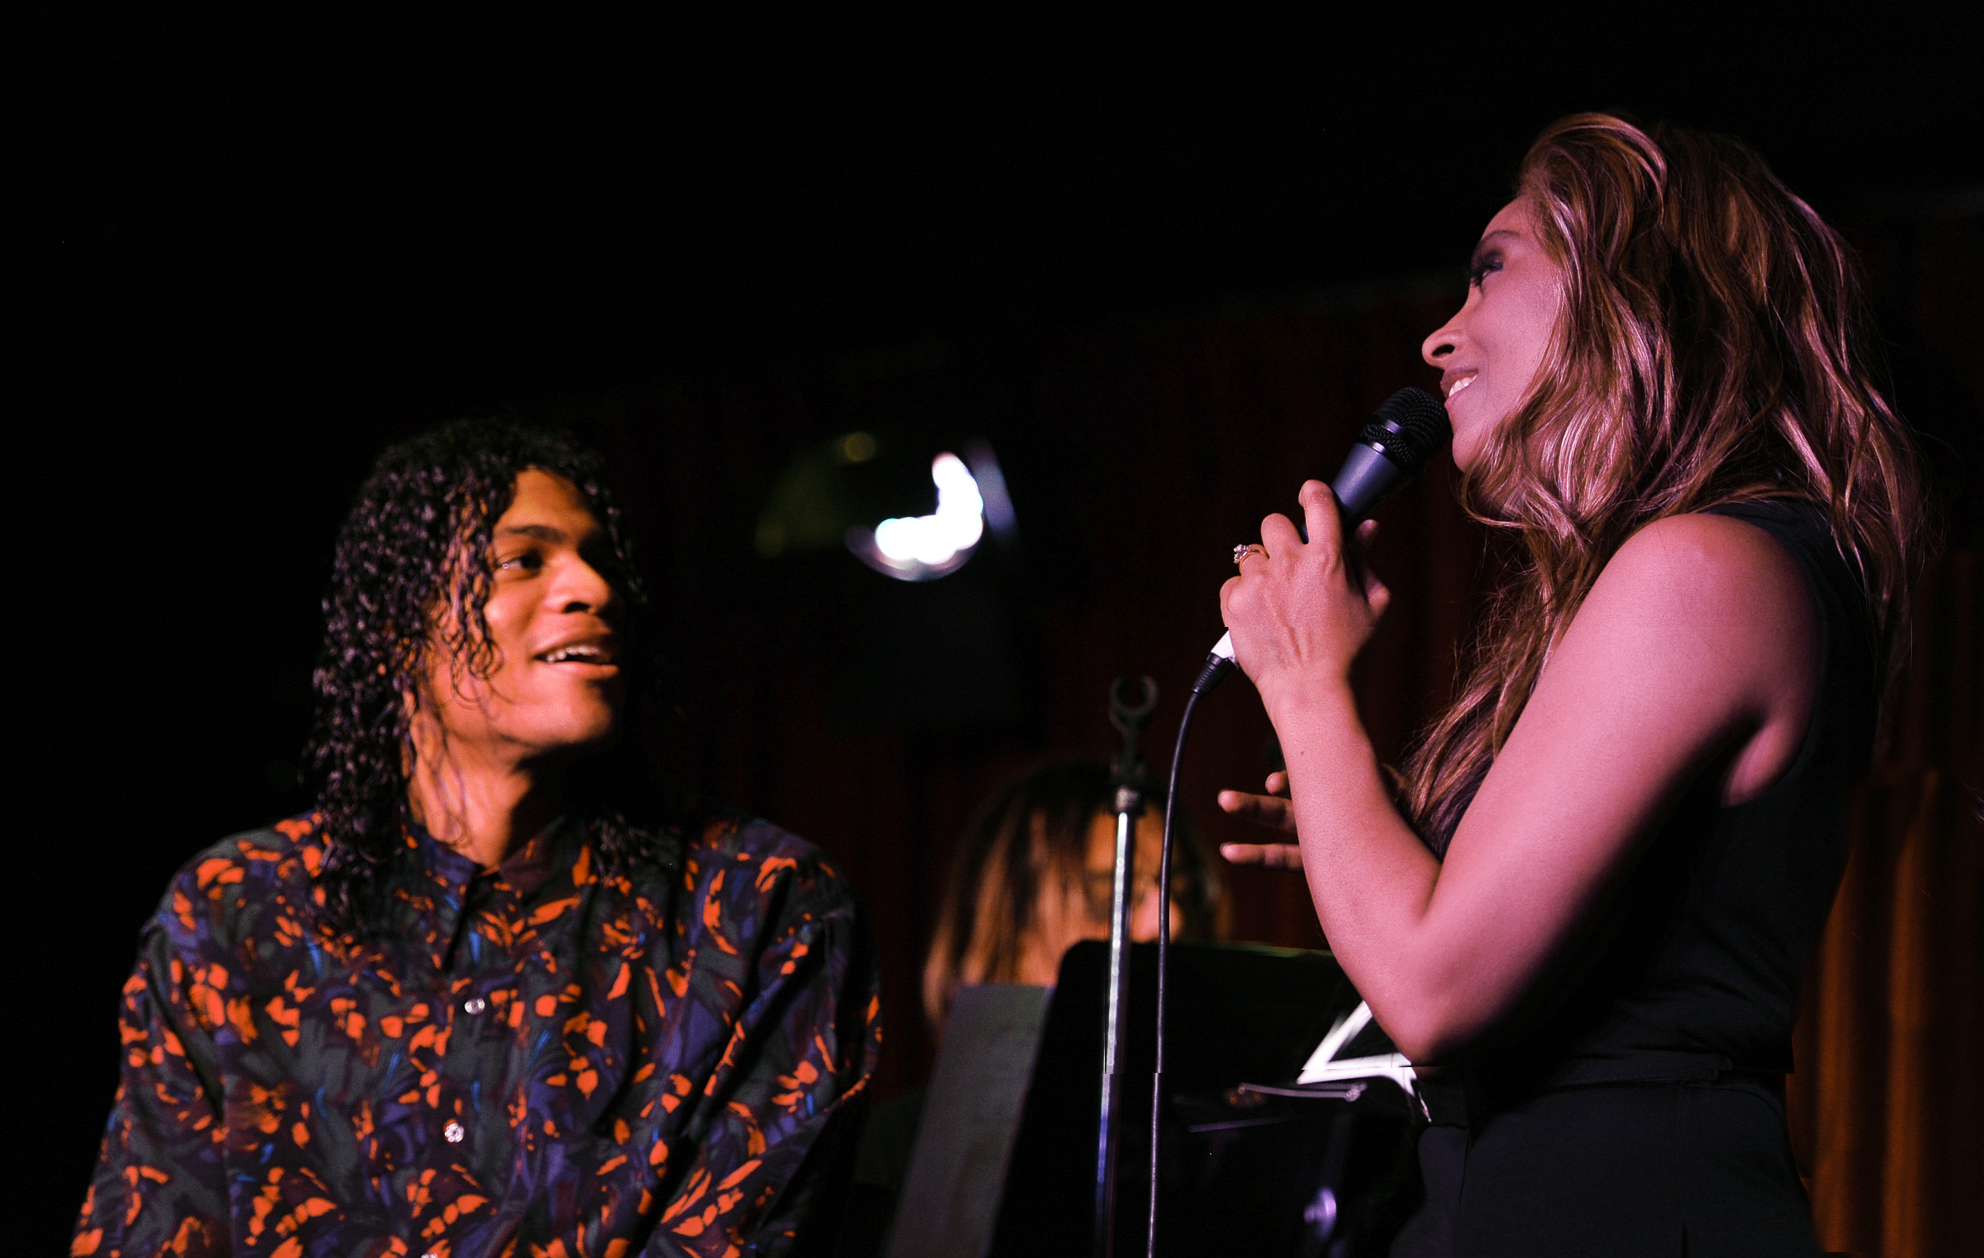 Kaylene Peoples Serenades Guest at Her Concert